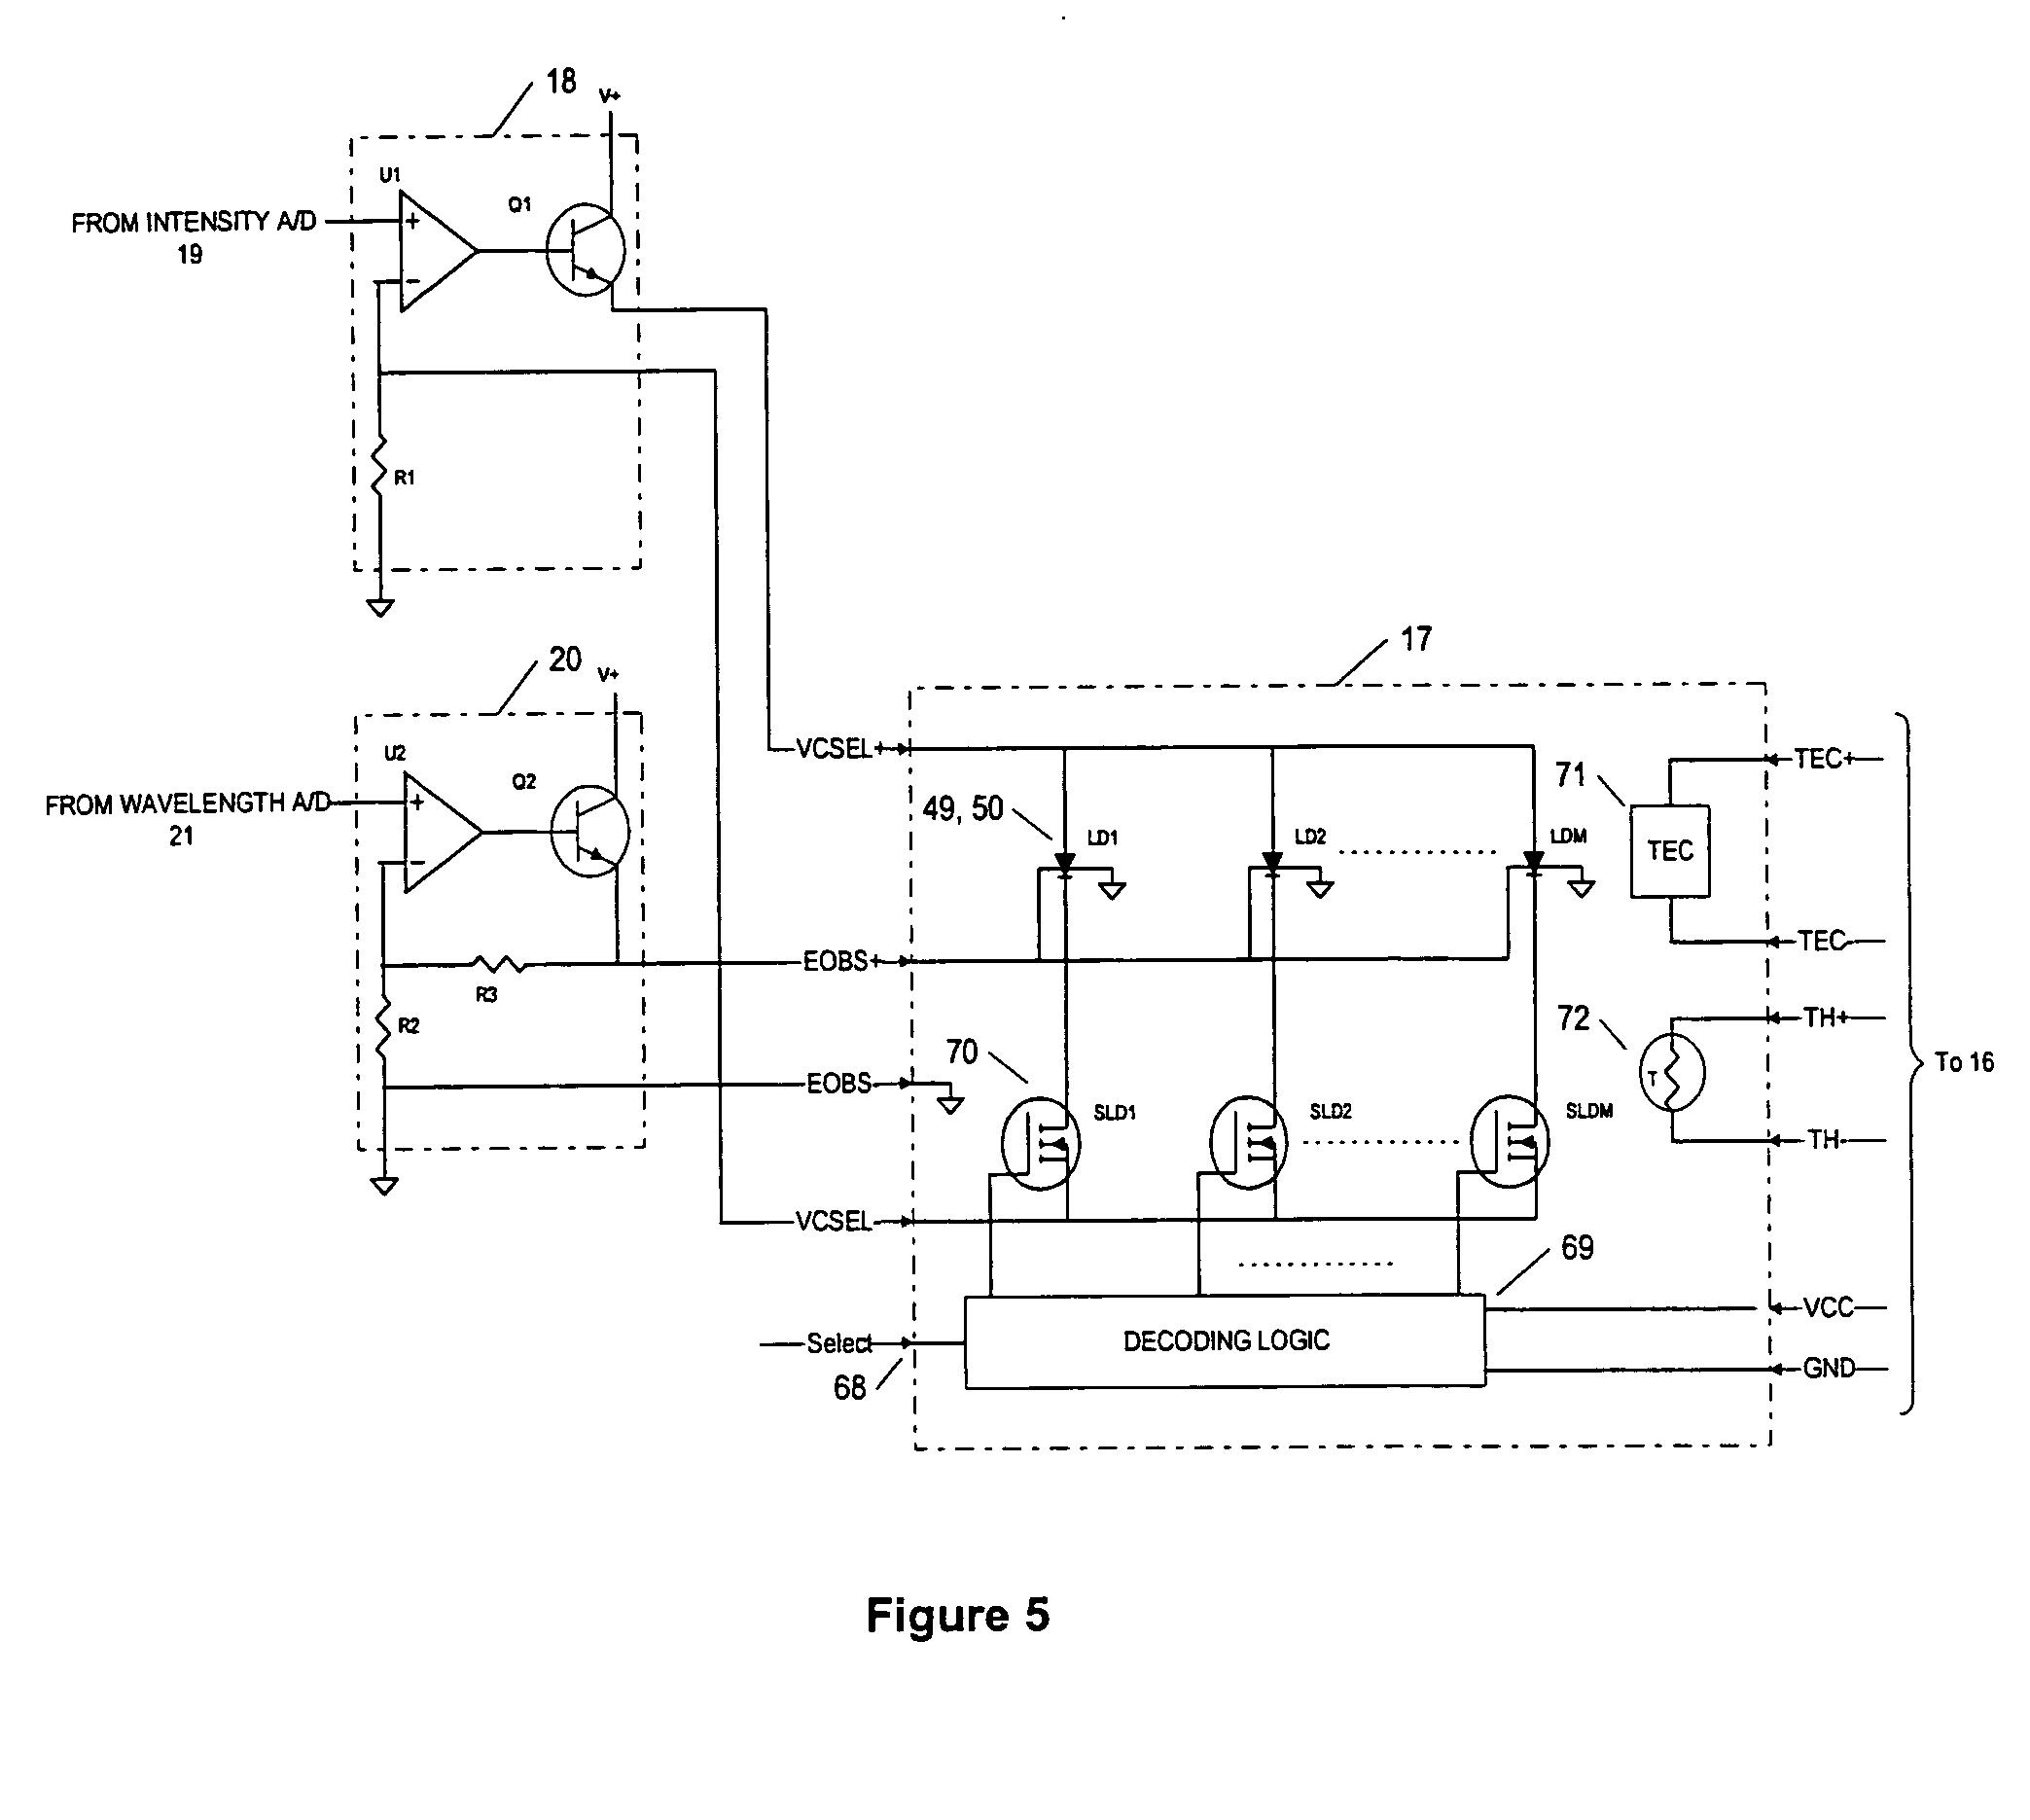 circuit diagram non invasive glucose meter download wiring diagrams u2022 rh sleeperfurniture co